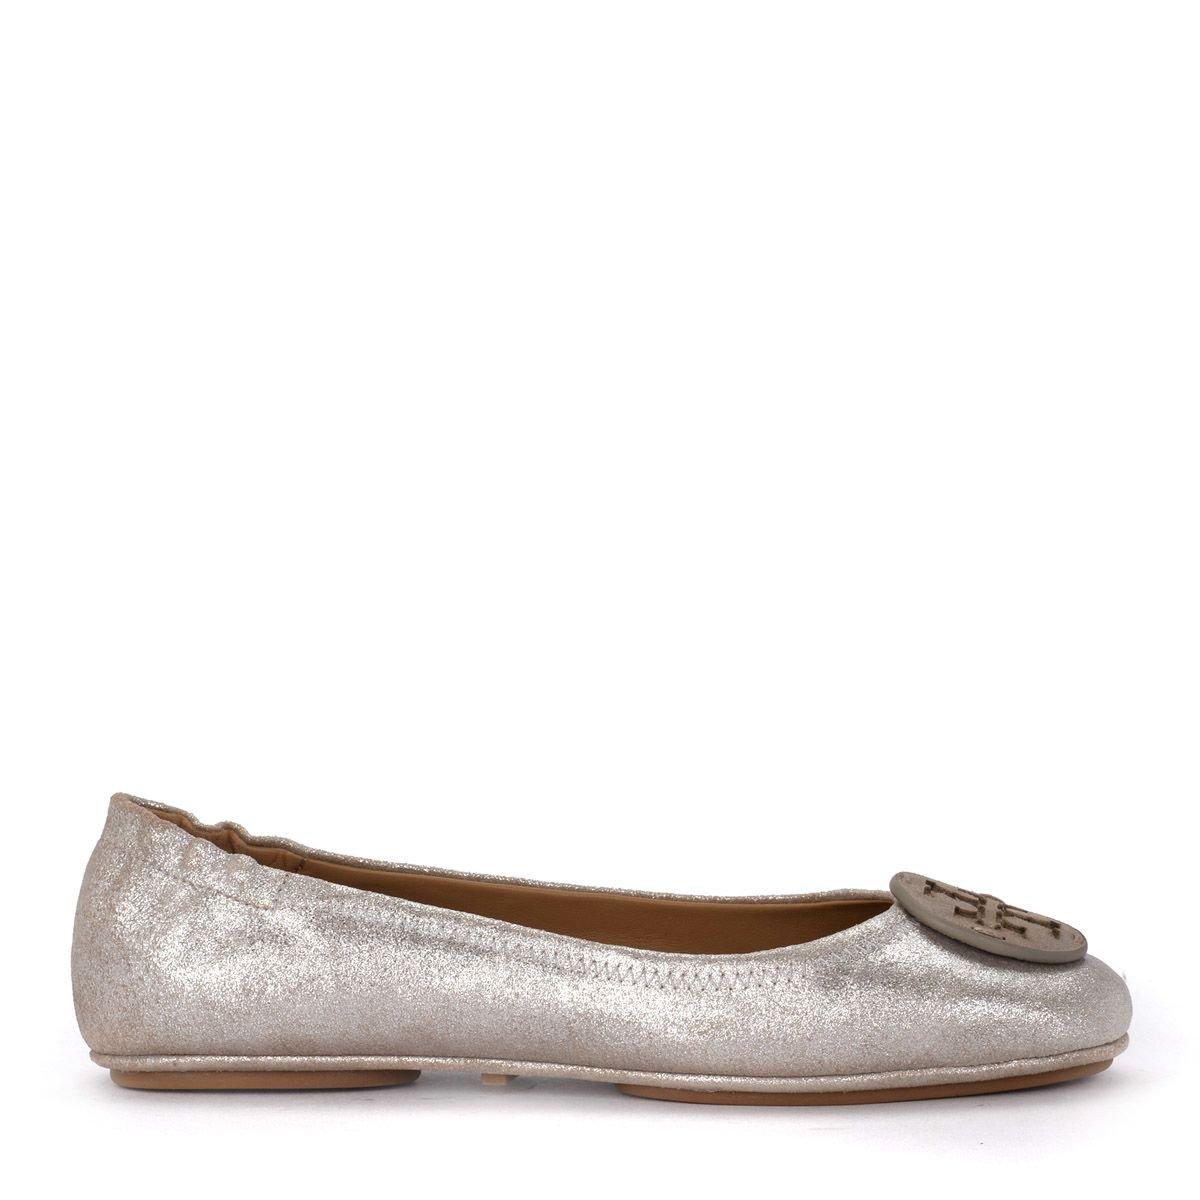 Tory Burch Minnie Travel Beige Metal Suede Flat Shoe